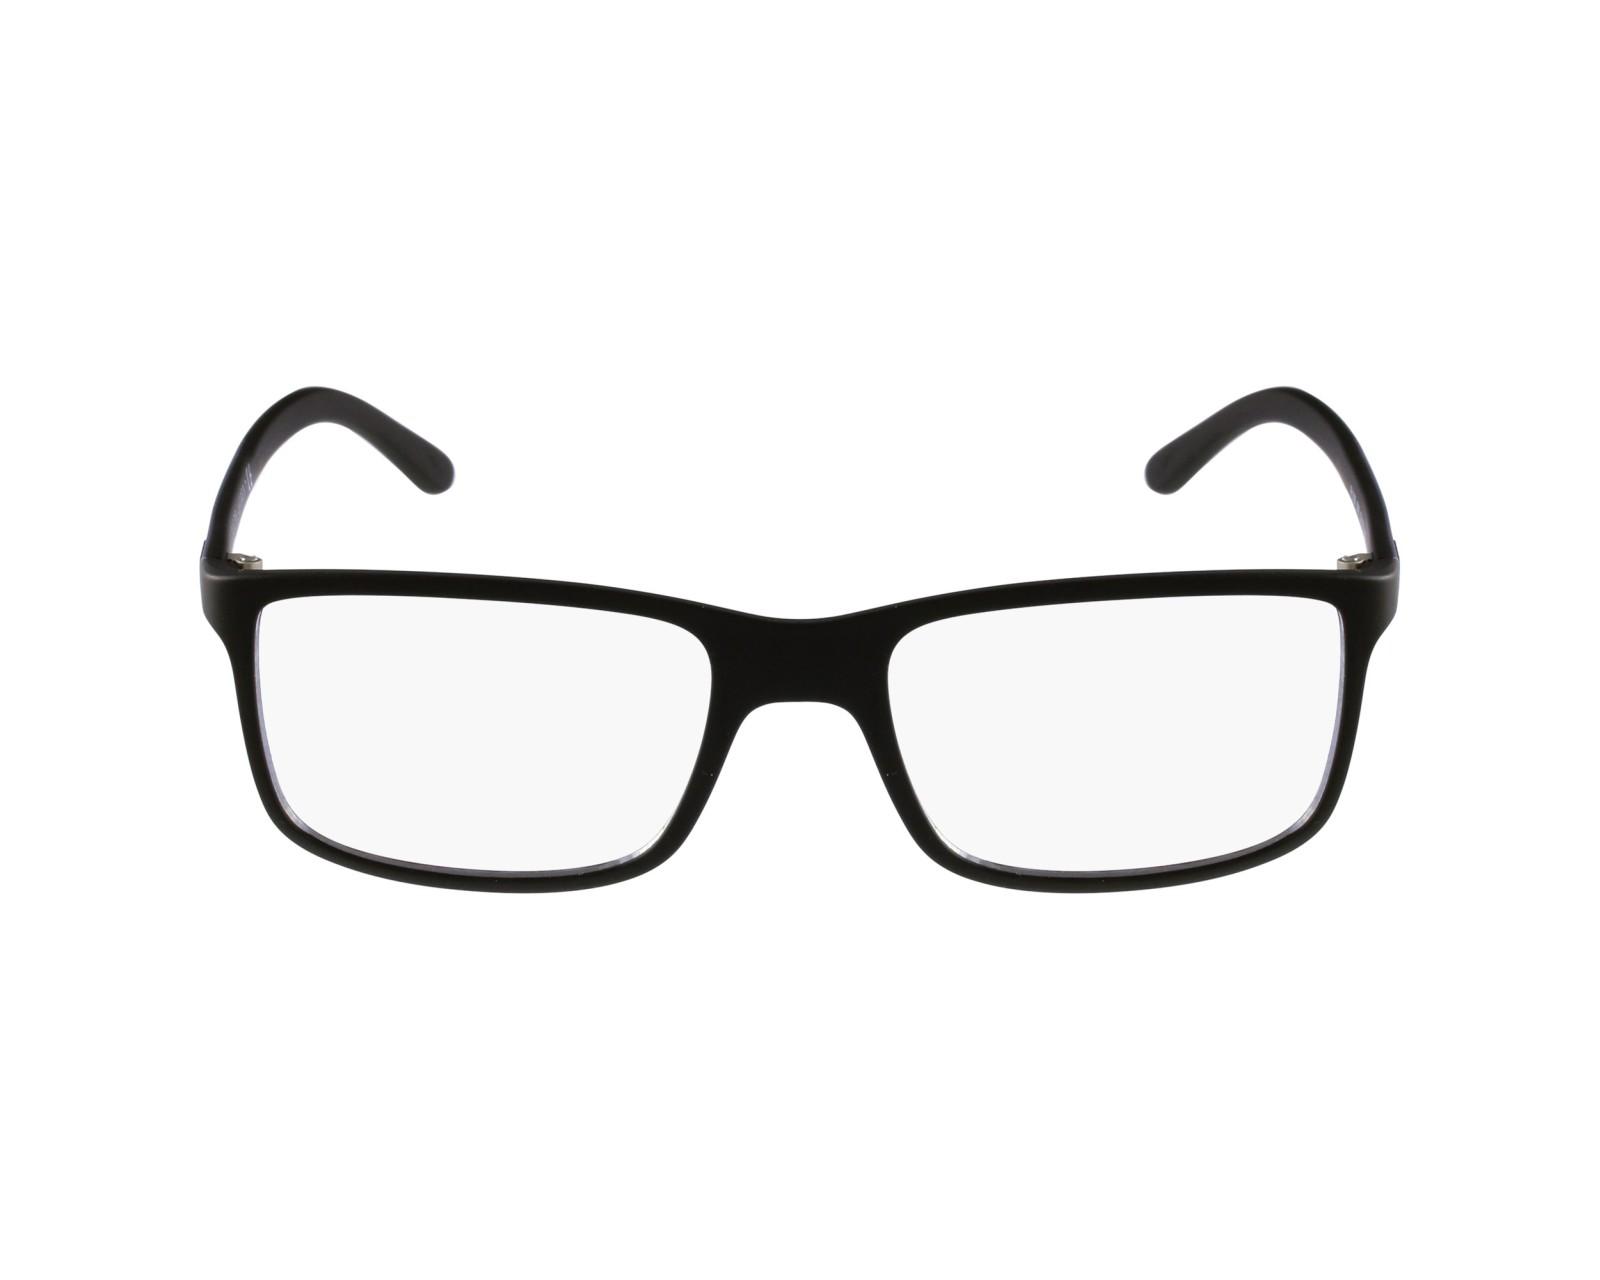 931ed54974 eyeglasses Polo Ralph Lauren PH-2126 5505 - Black profile view